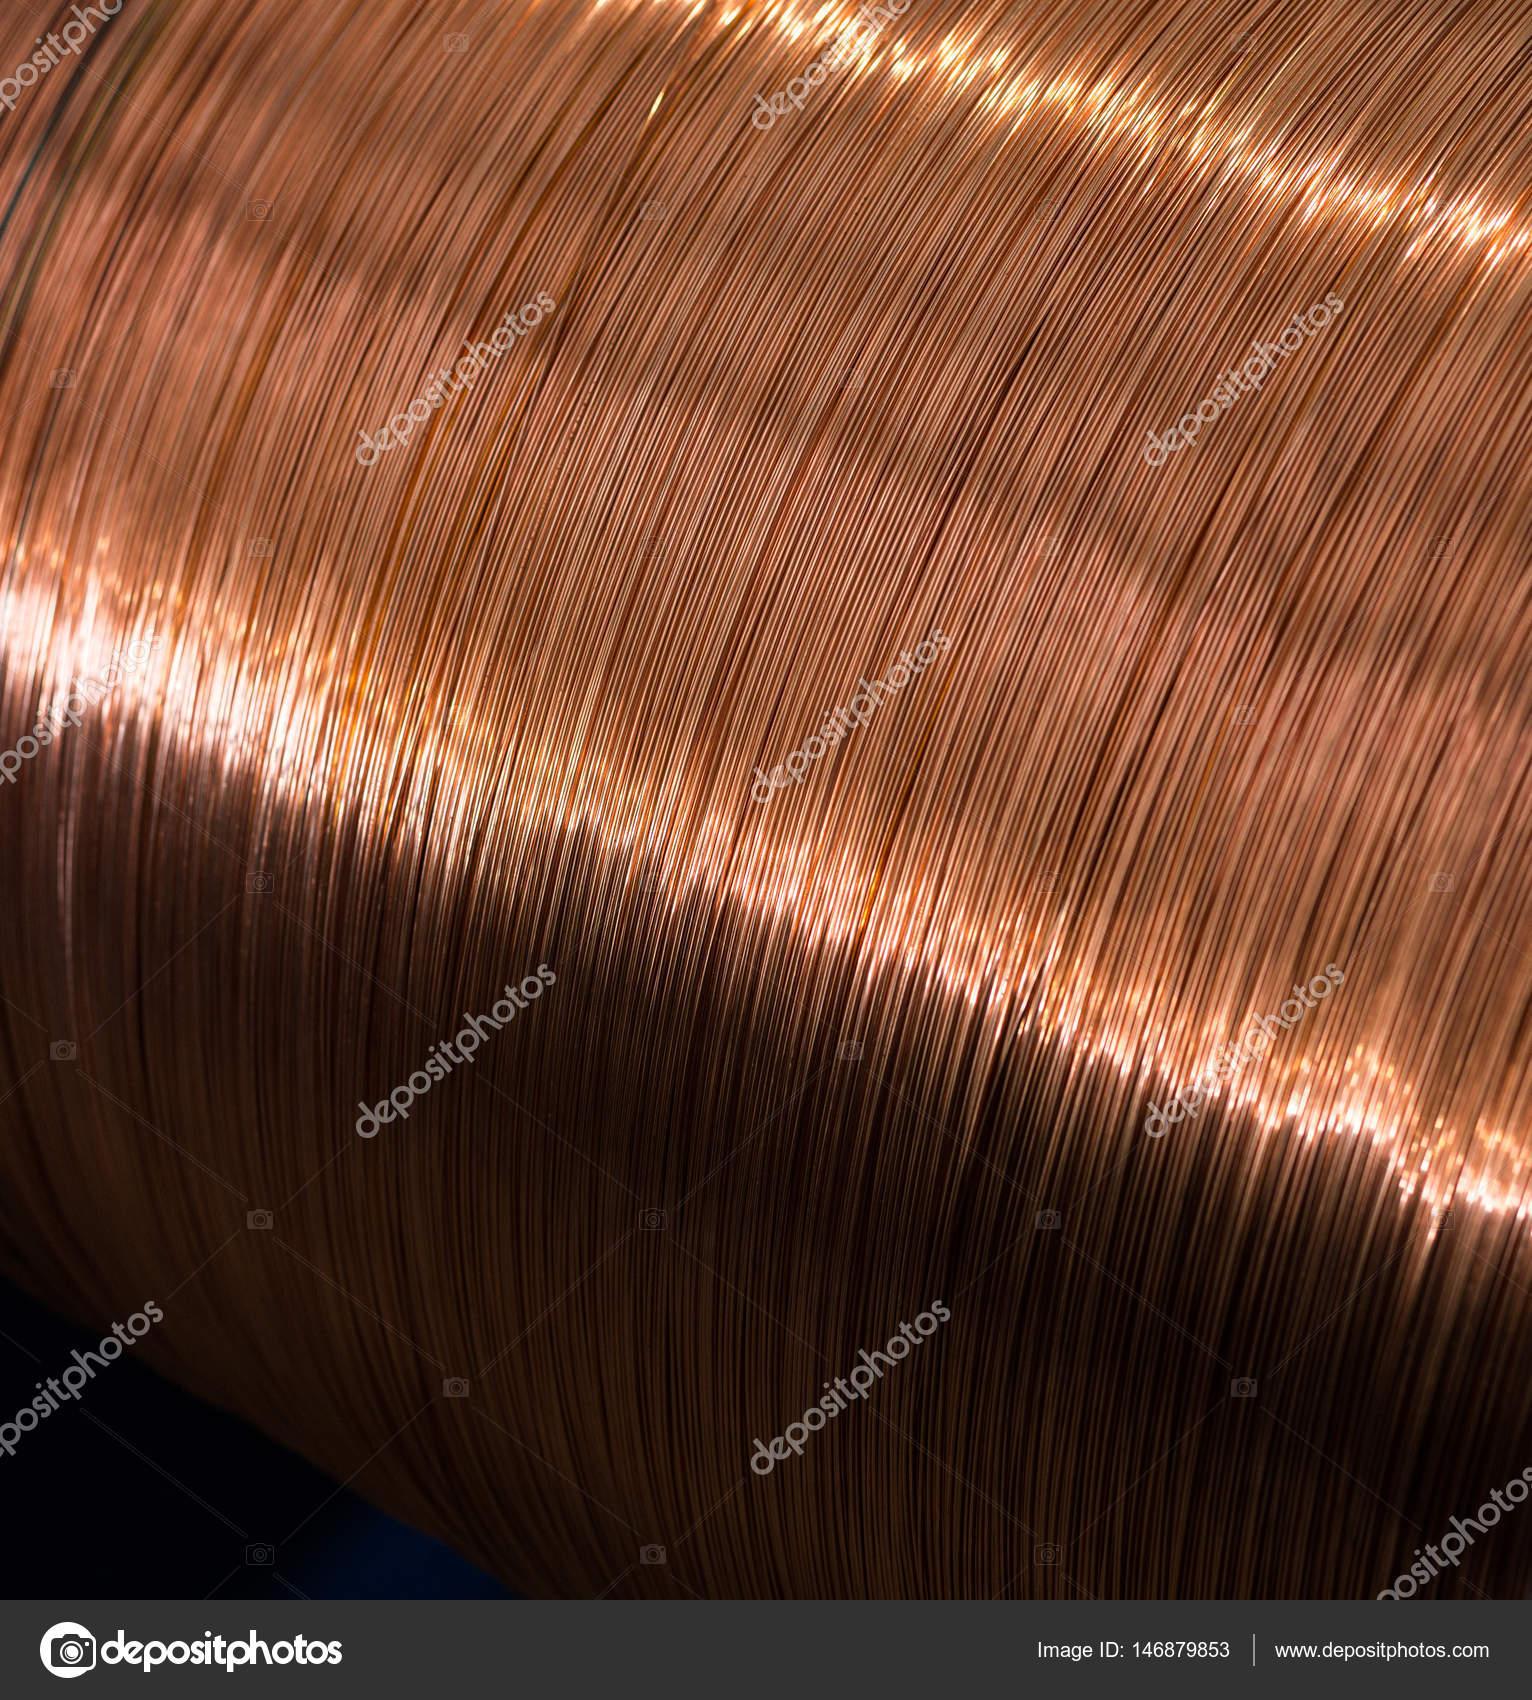 Farbige Elektrokabel farbige kabel stockfoto fotofabrika 146879853